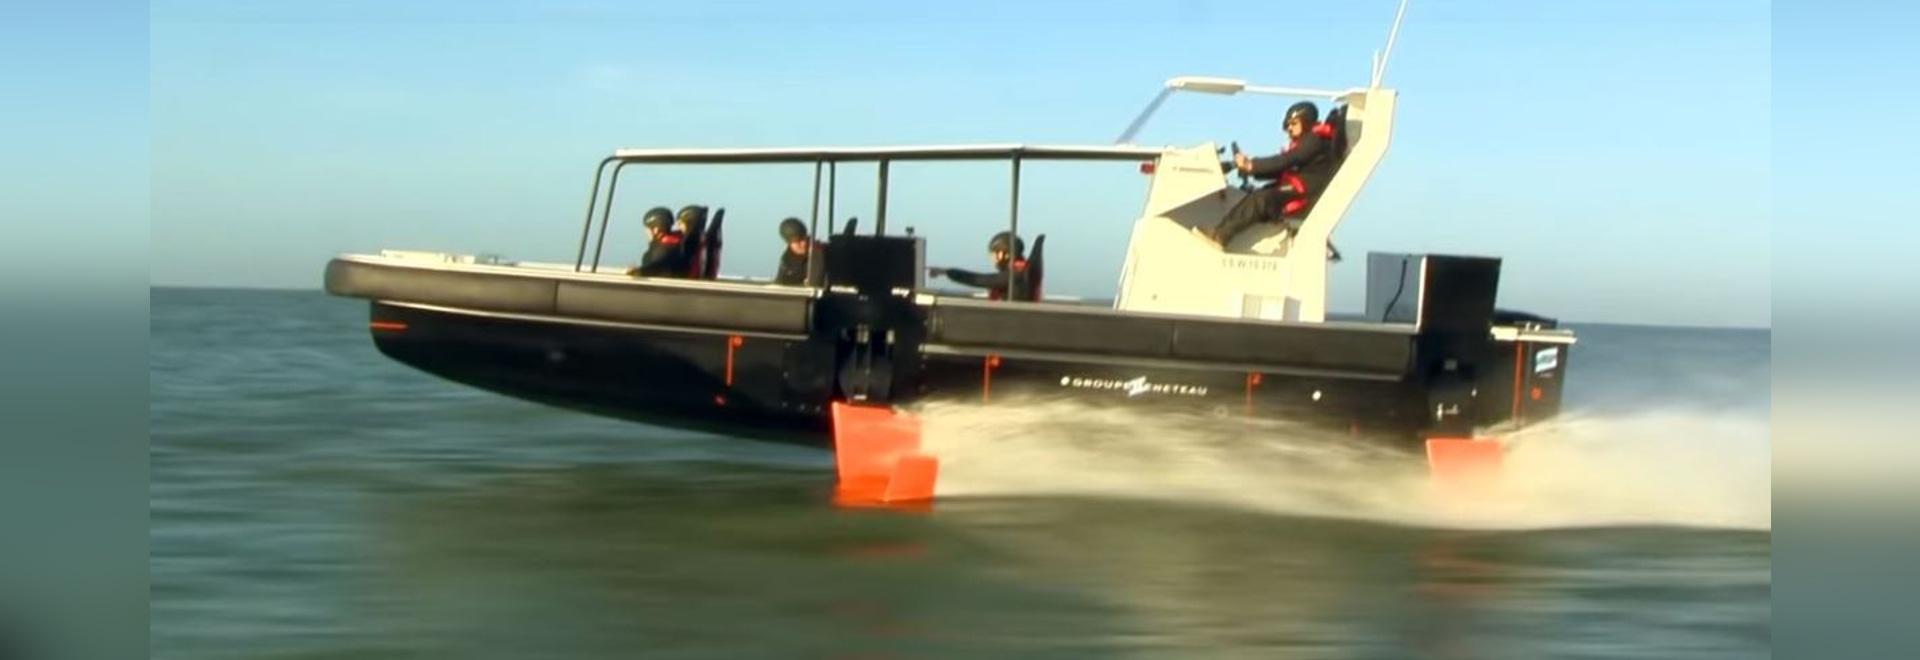 Groupe Beneteau unveils its first motor foiler